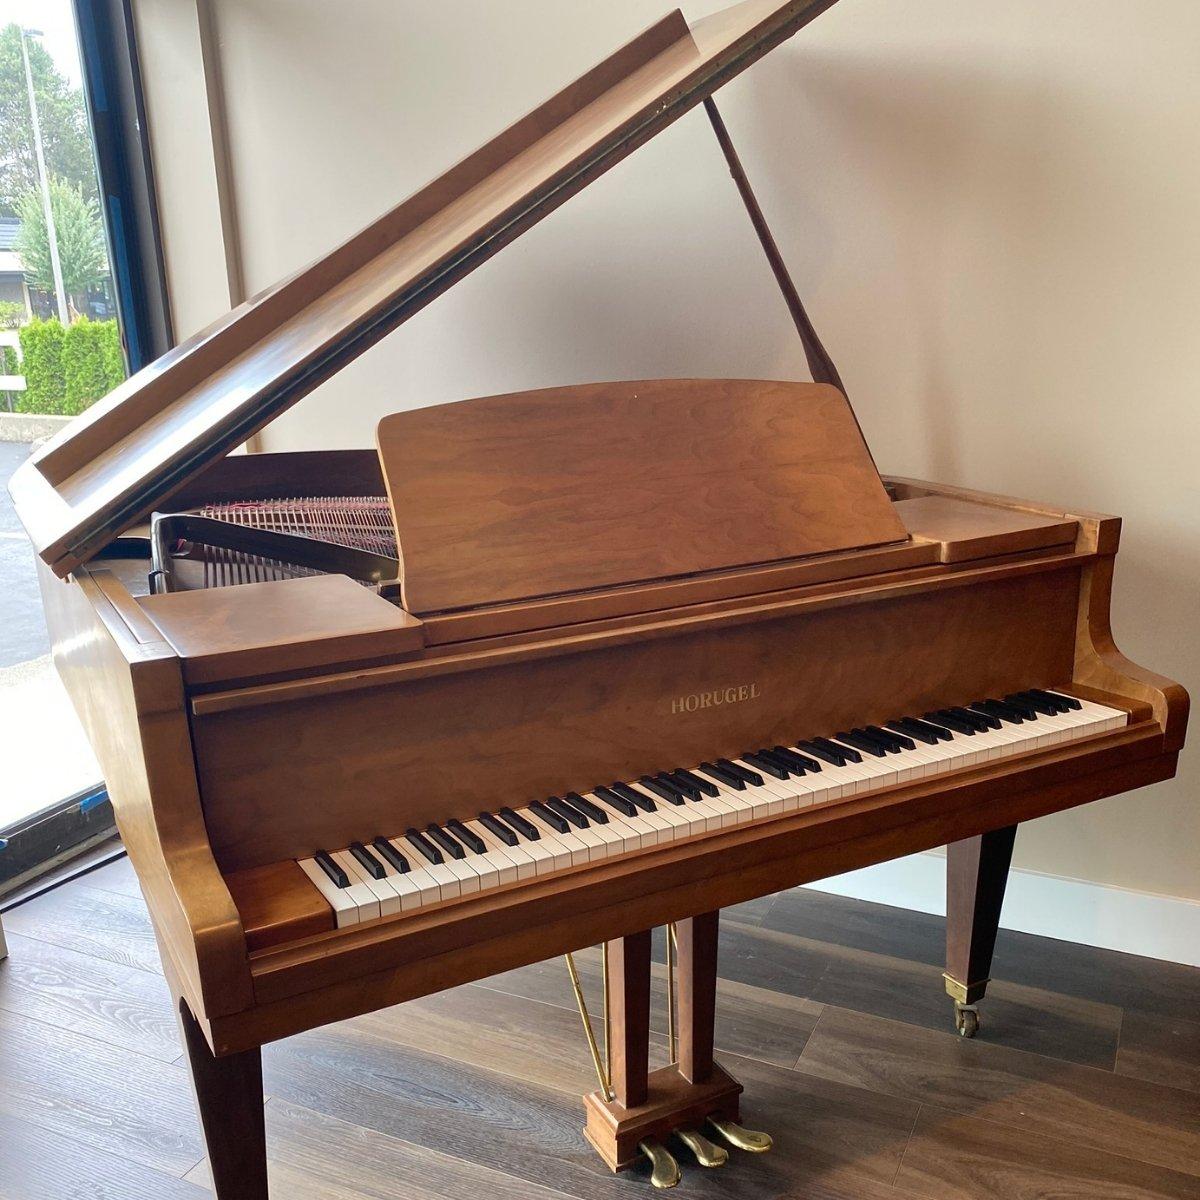 SOLD - Horugel 5'8 M5102 Grand Piano